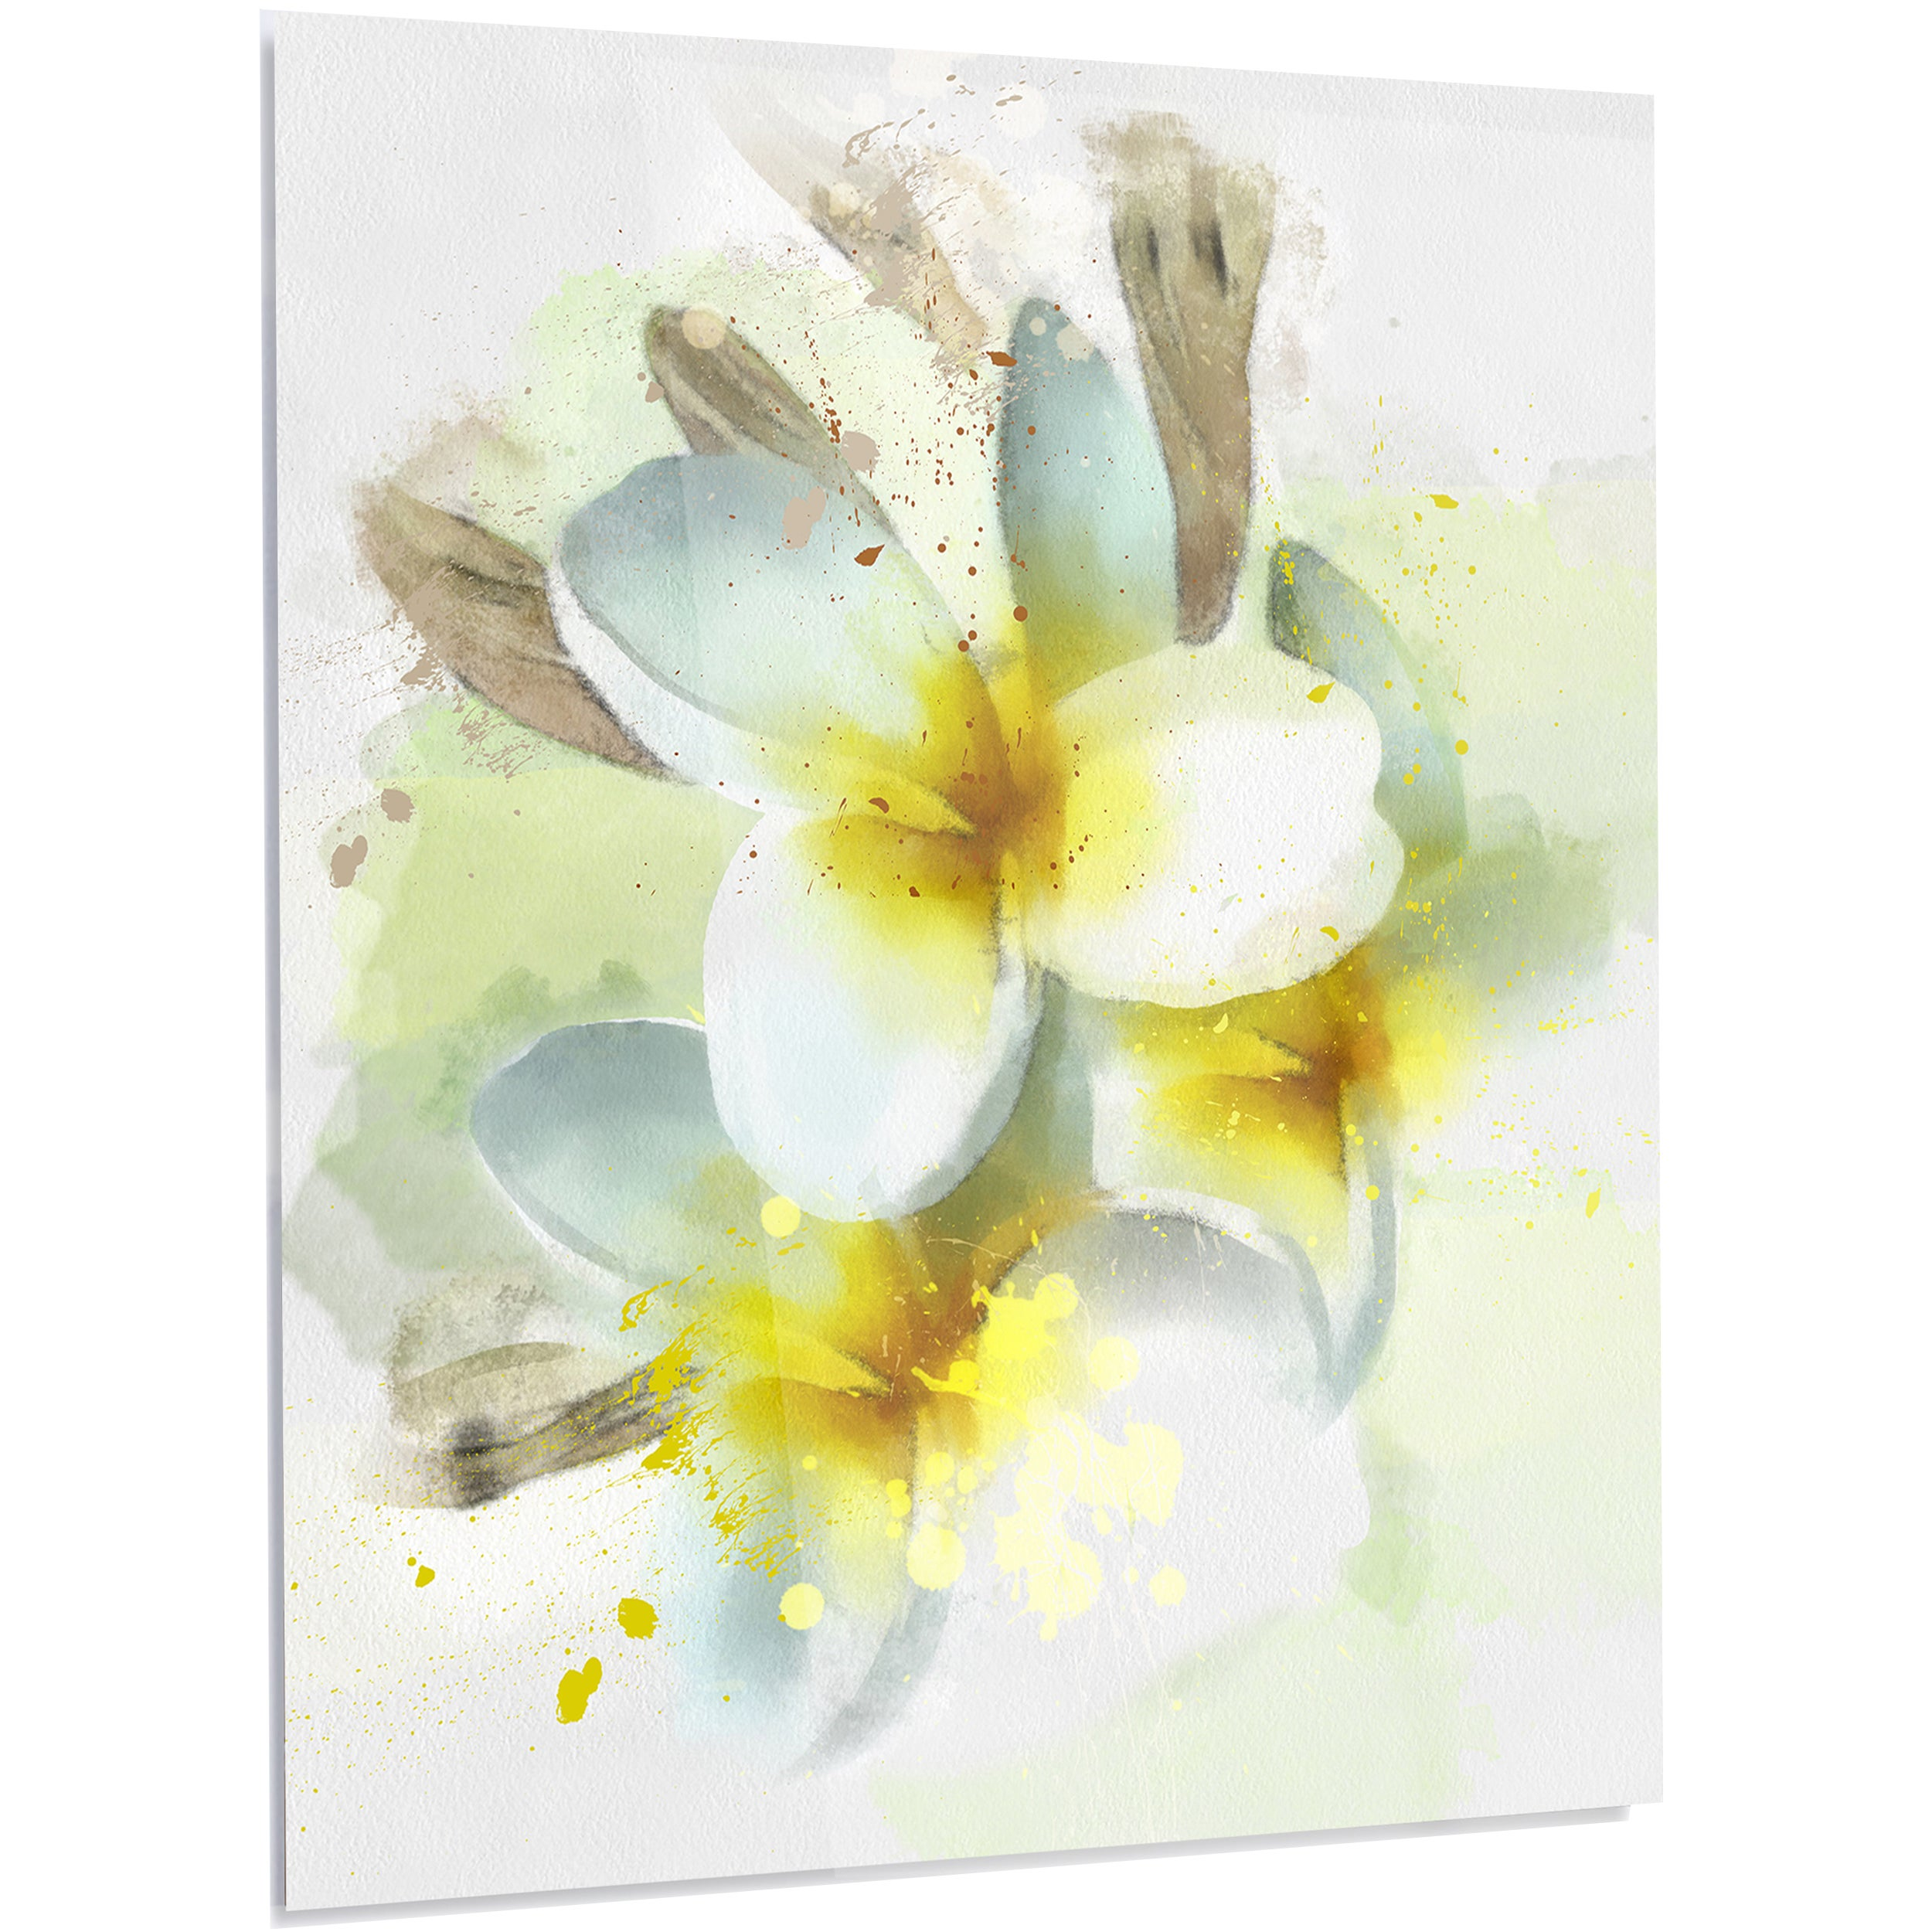 Dorable Metal Flower Wall Art Crest - Wall Art Collections ...